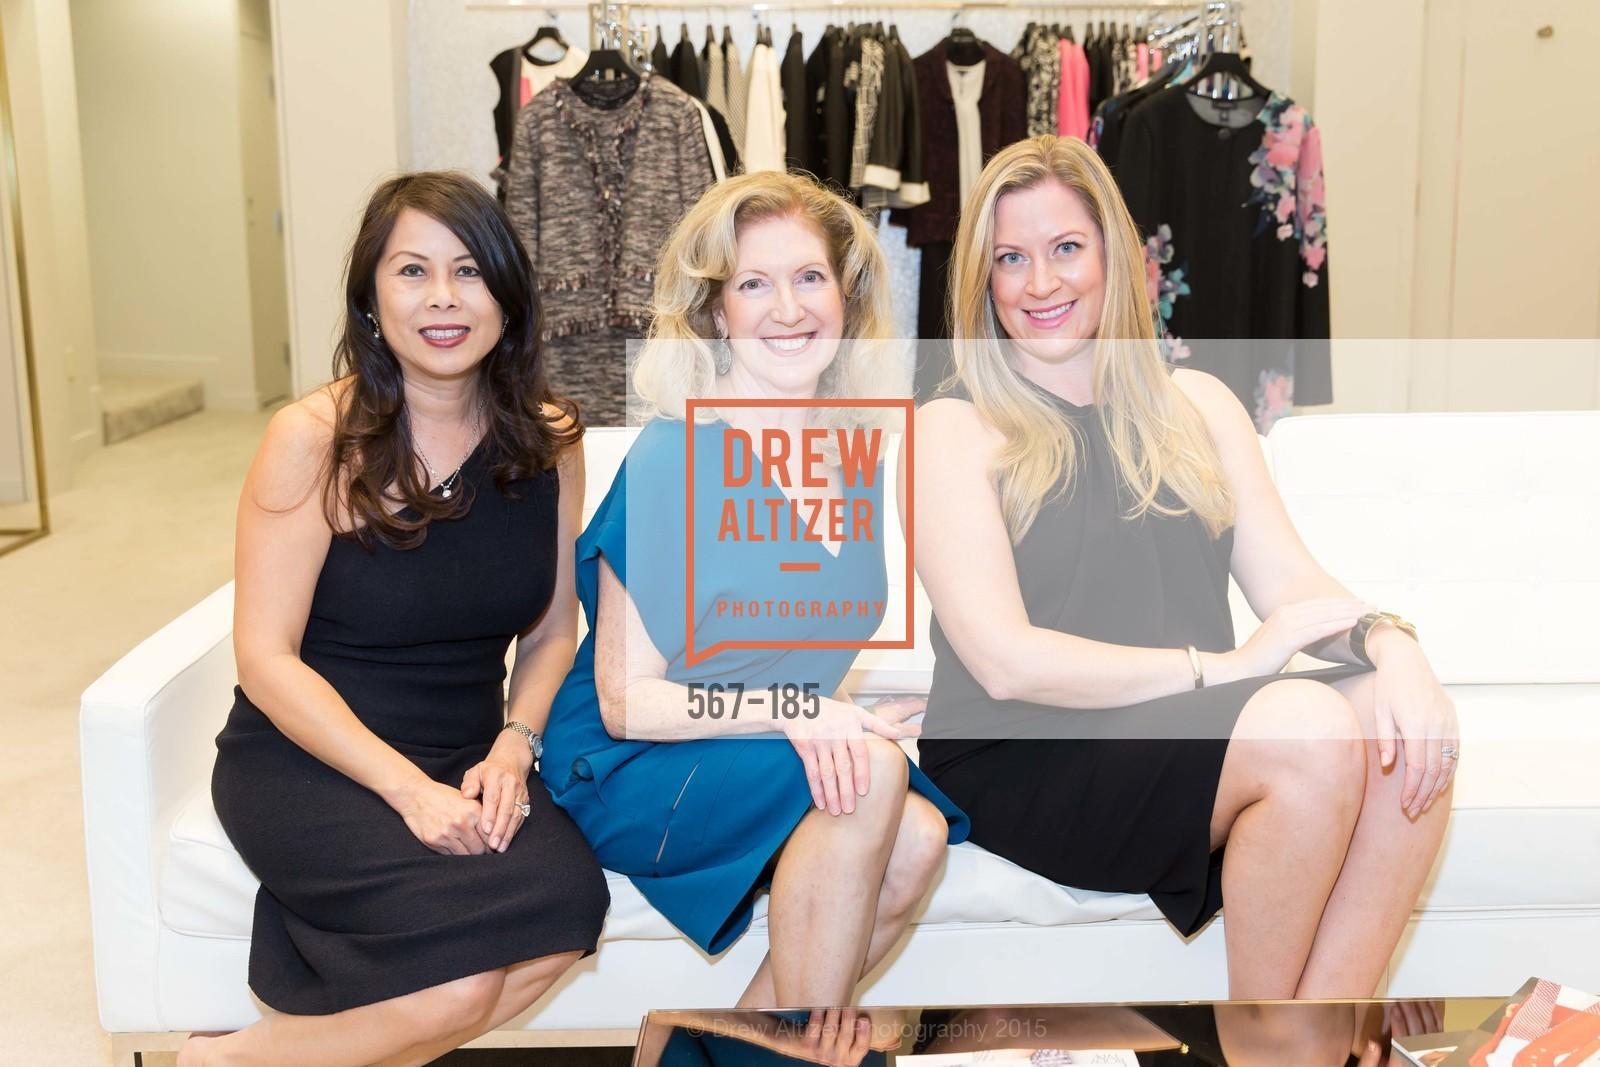 Sharon Seto, Celeste Woo, Maggie Hazelrig, Photo #567-185